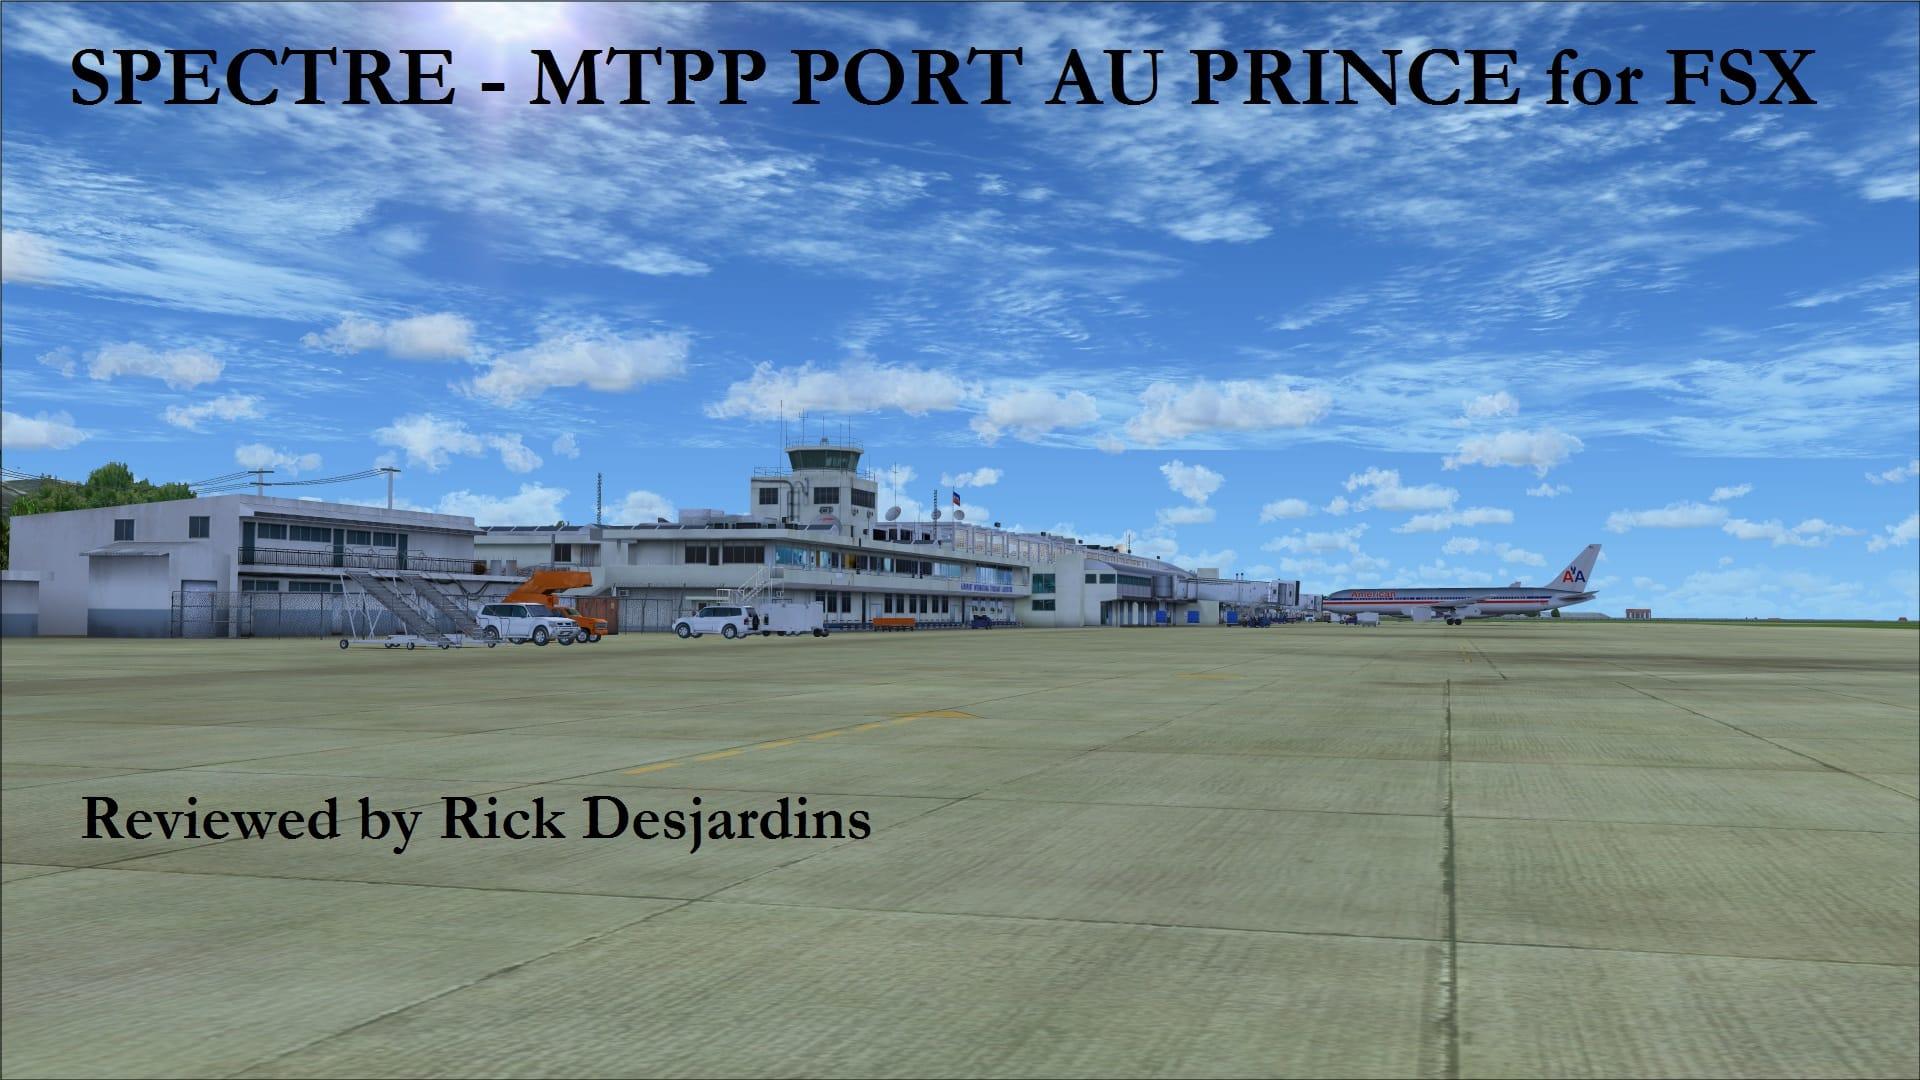 Review of SPECTRE – MTPP PORT AU PRINCE FSX